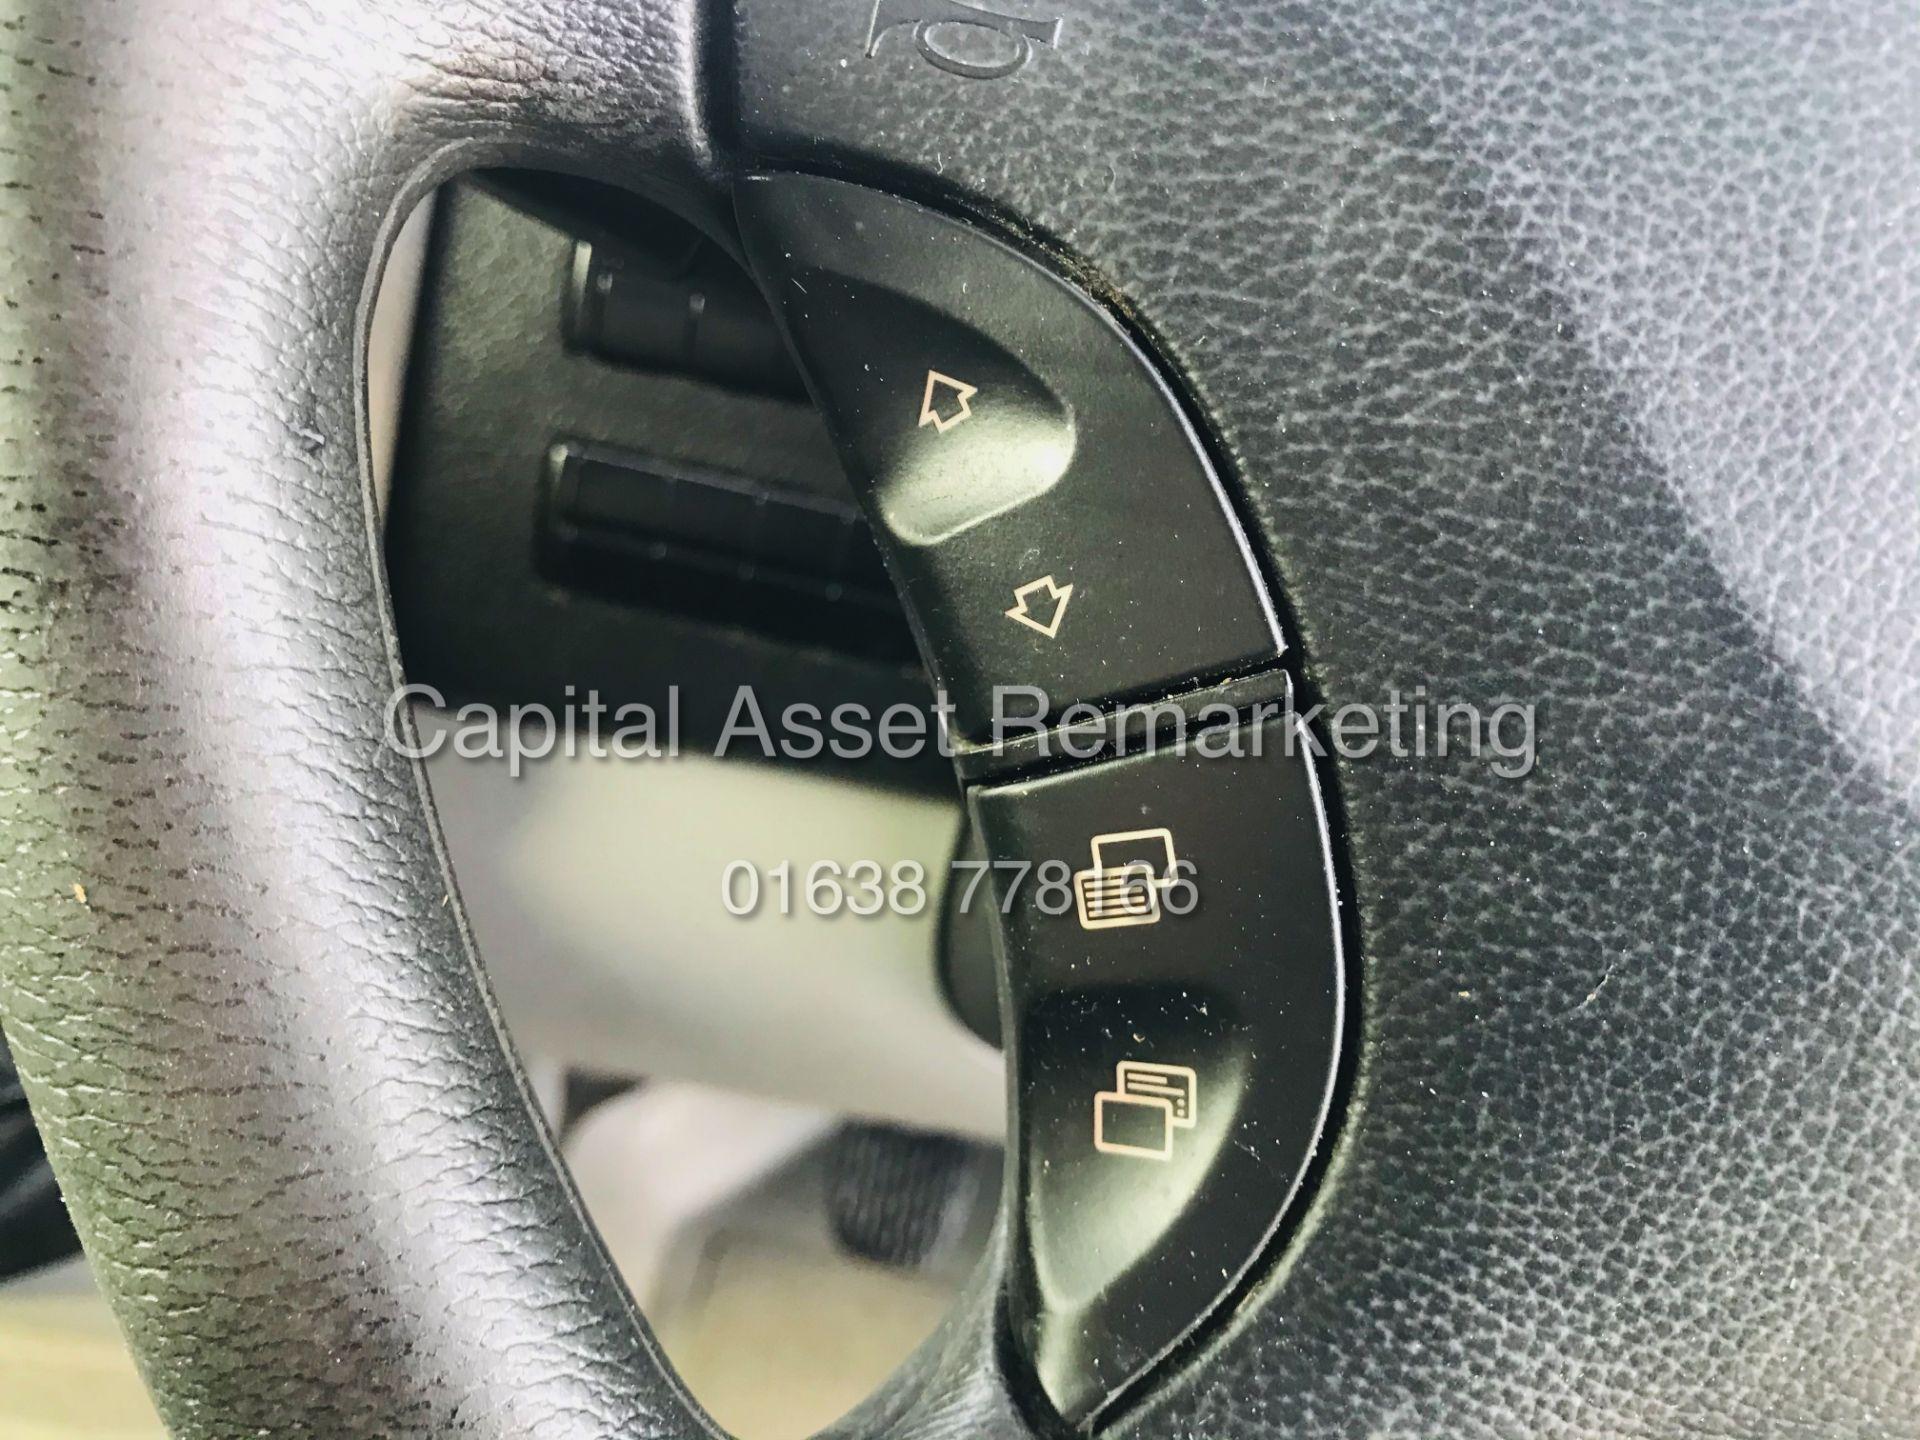 ON SALE VW CRAFTER 2.0TDI CR35 (15 REG) 1 OWNER - CRUISE - ELEC PACK - MULTIFUNCTION STEERING WHEEL - Image 18 of 19